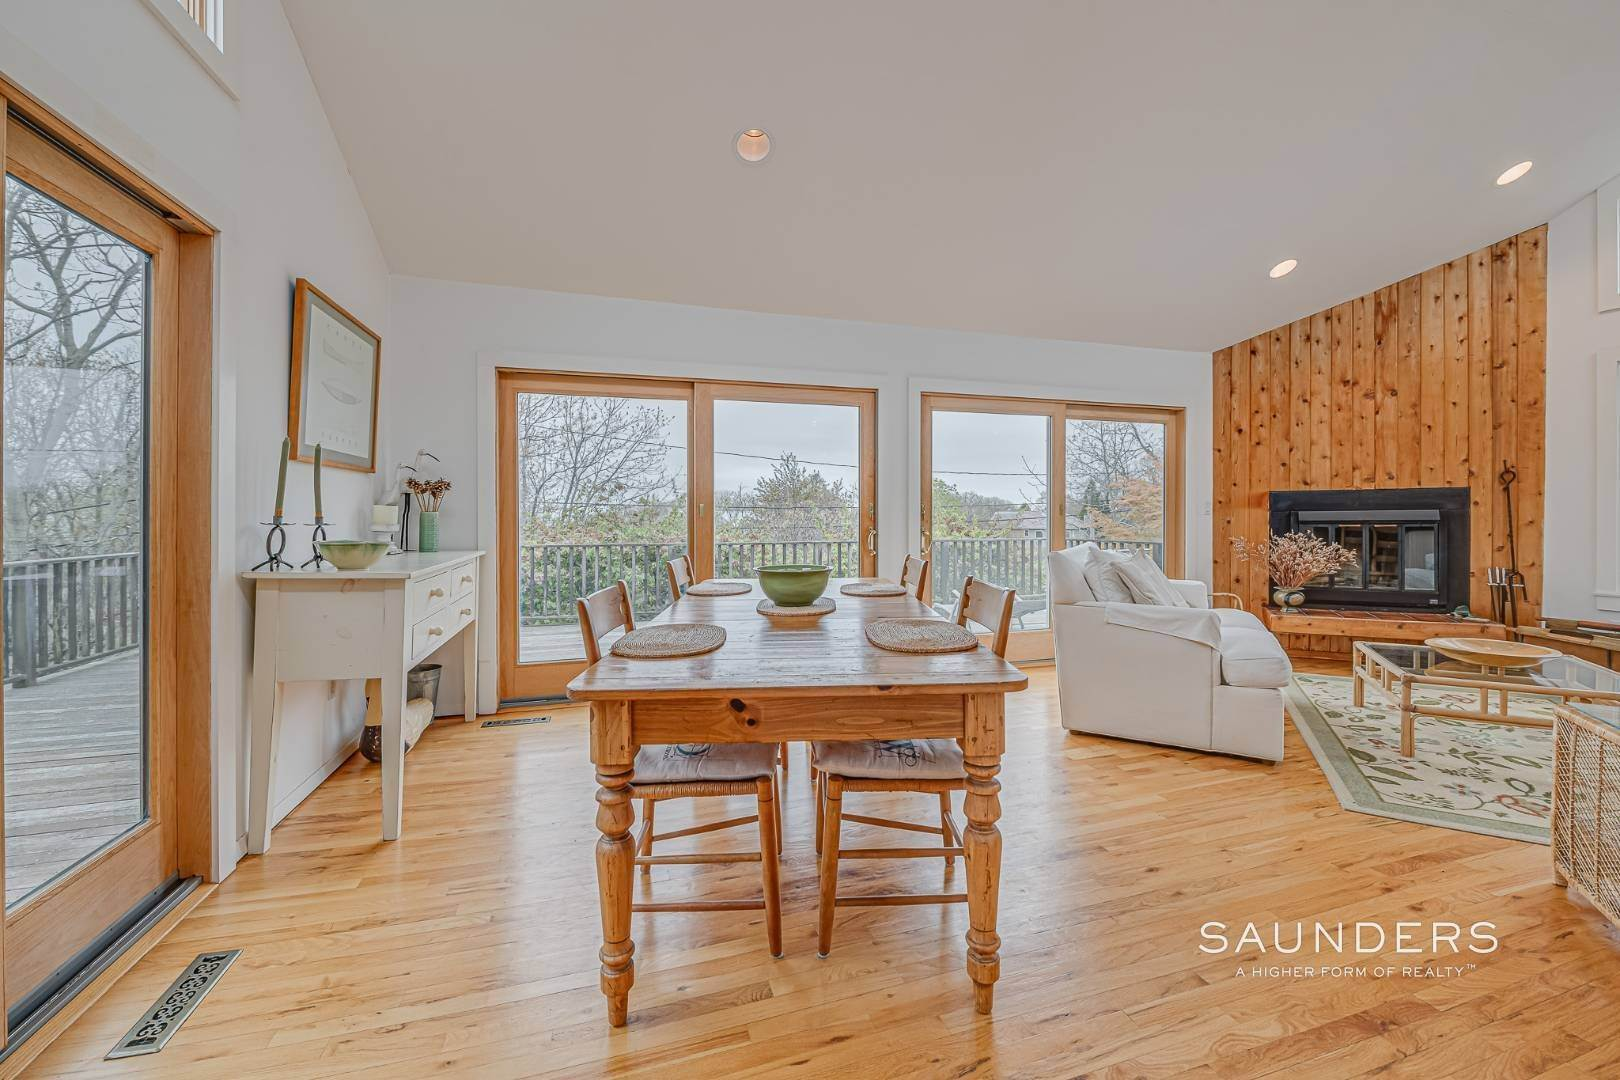 4. Single Family Homes for Sale at Montauk Beach House 8 Stuyvesant Drive, Montauk, East Hampton Town, NY 11954